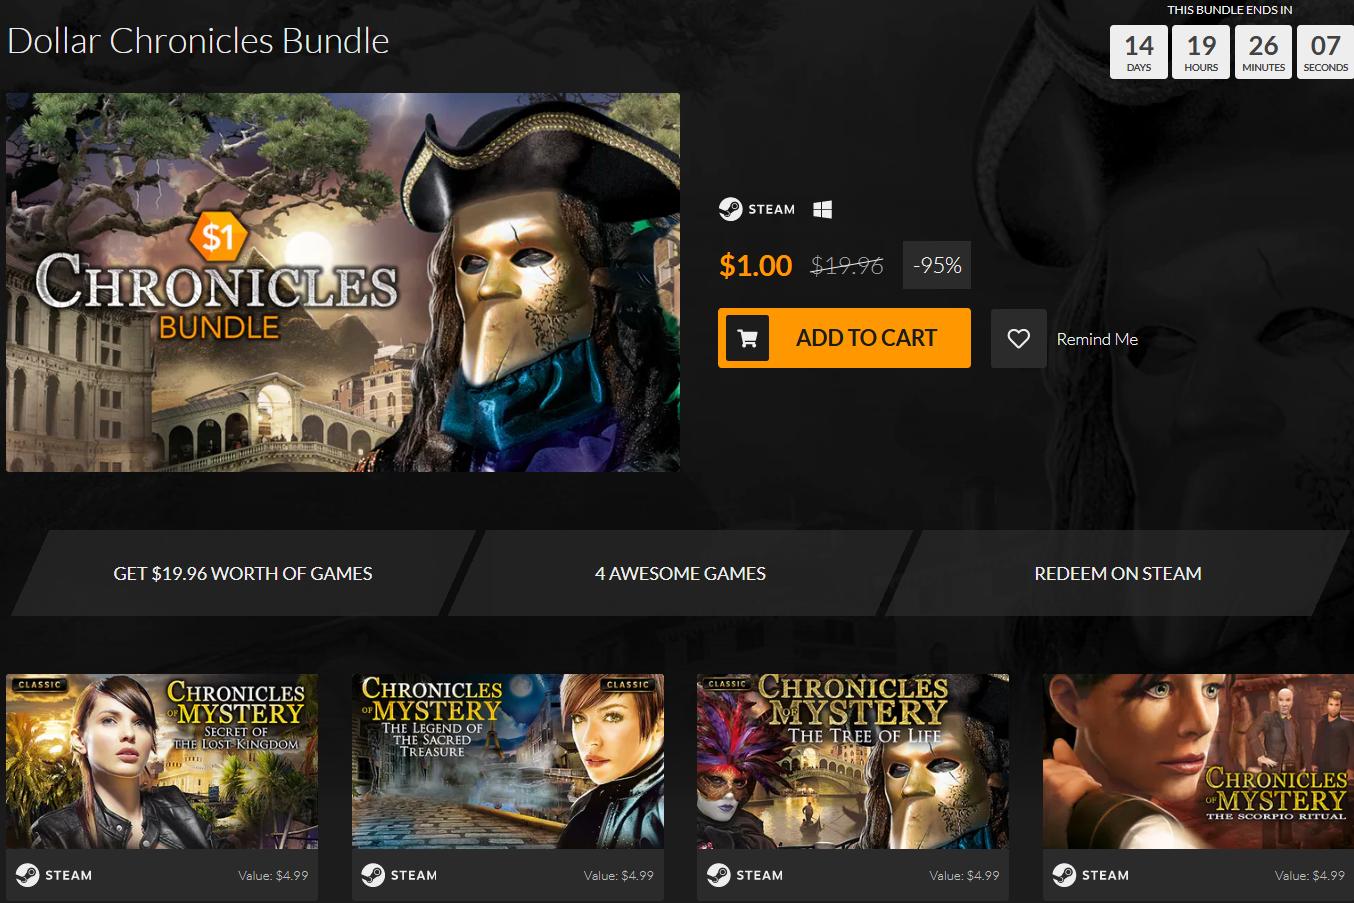 Screenshot_2019-03-28 Dollar Chronicles Bundle Steam Game Bundle Fanatical.png